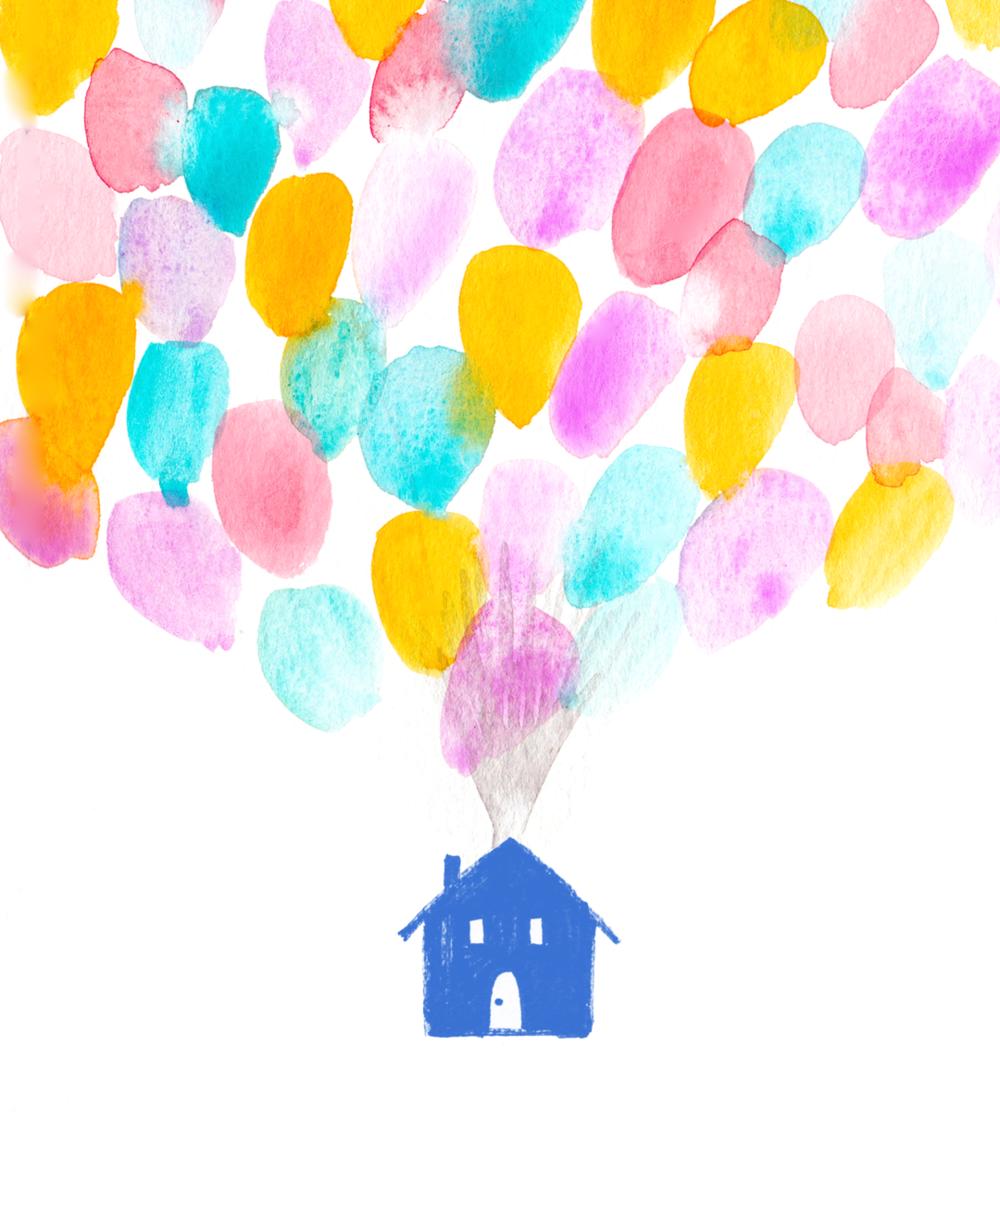 PatriceHorvathDesign_HouseWarming_Balloons.png